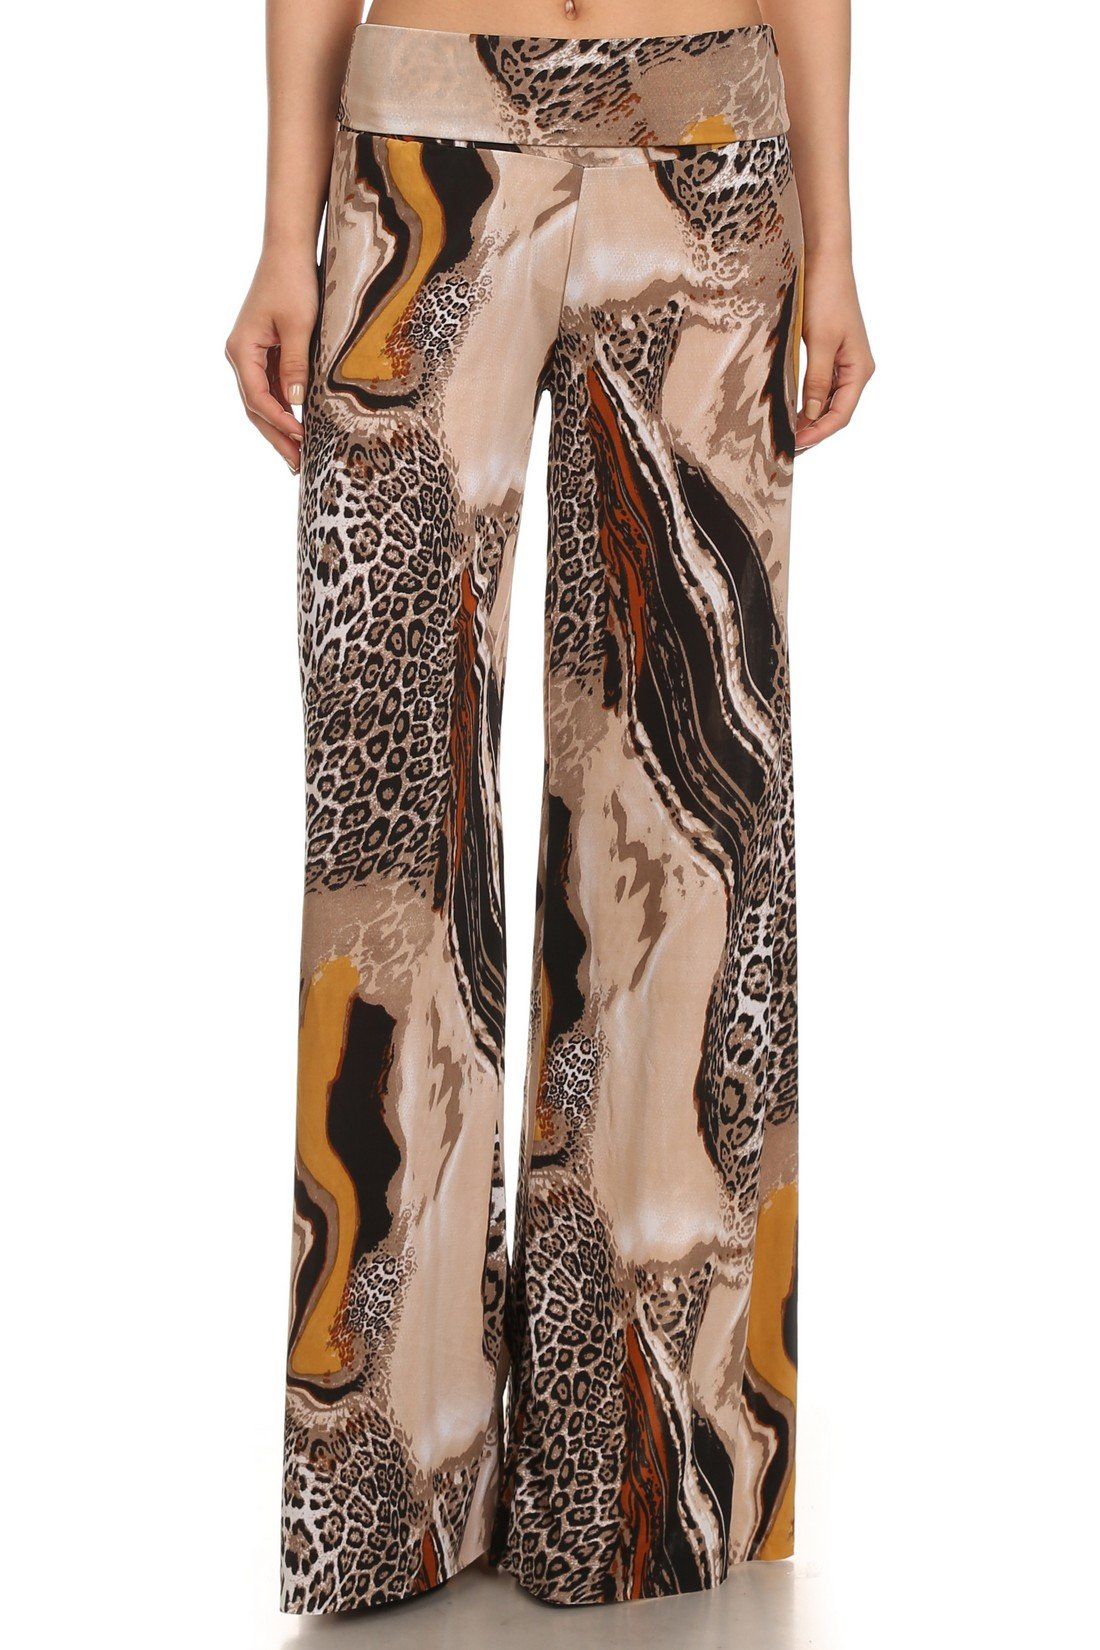 Yelete Lady's Printed Palazzo Pants (Milky Way Cheetah, Medium)